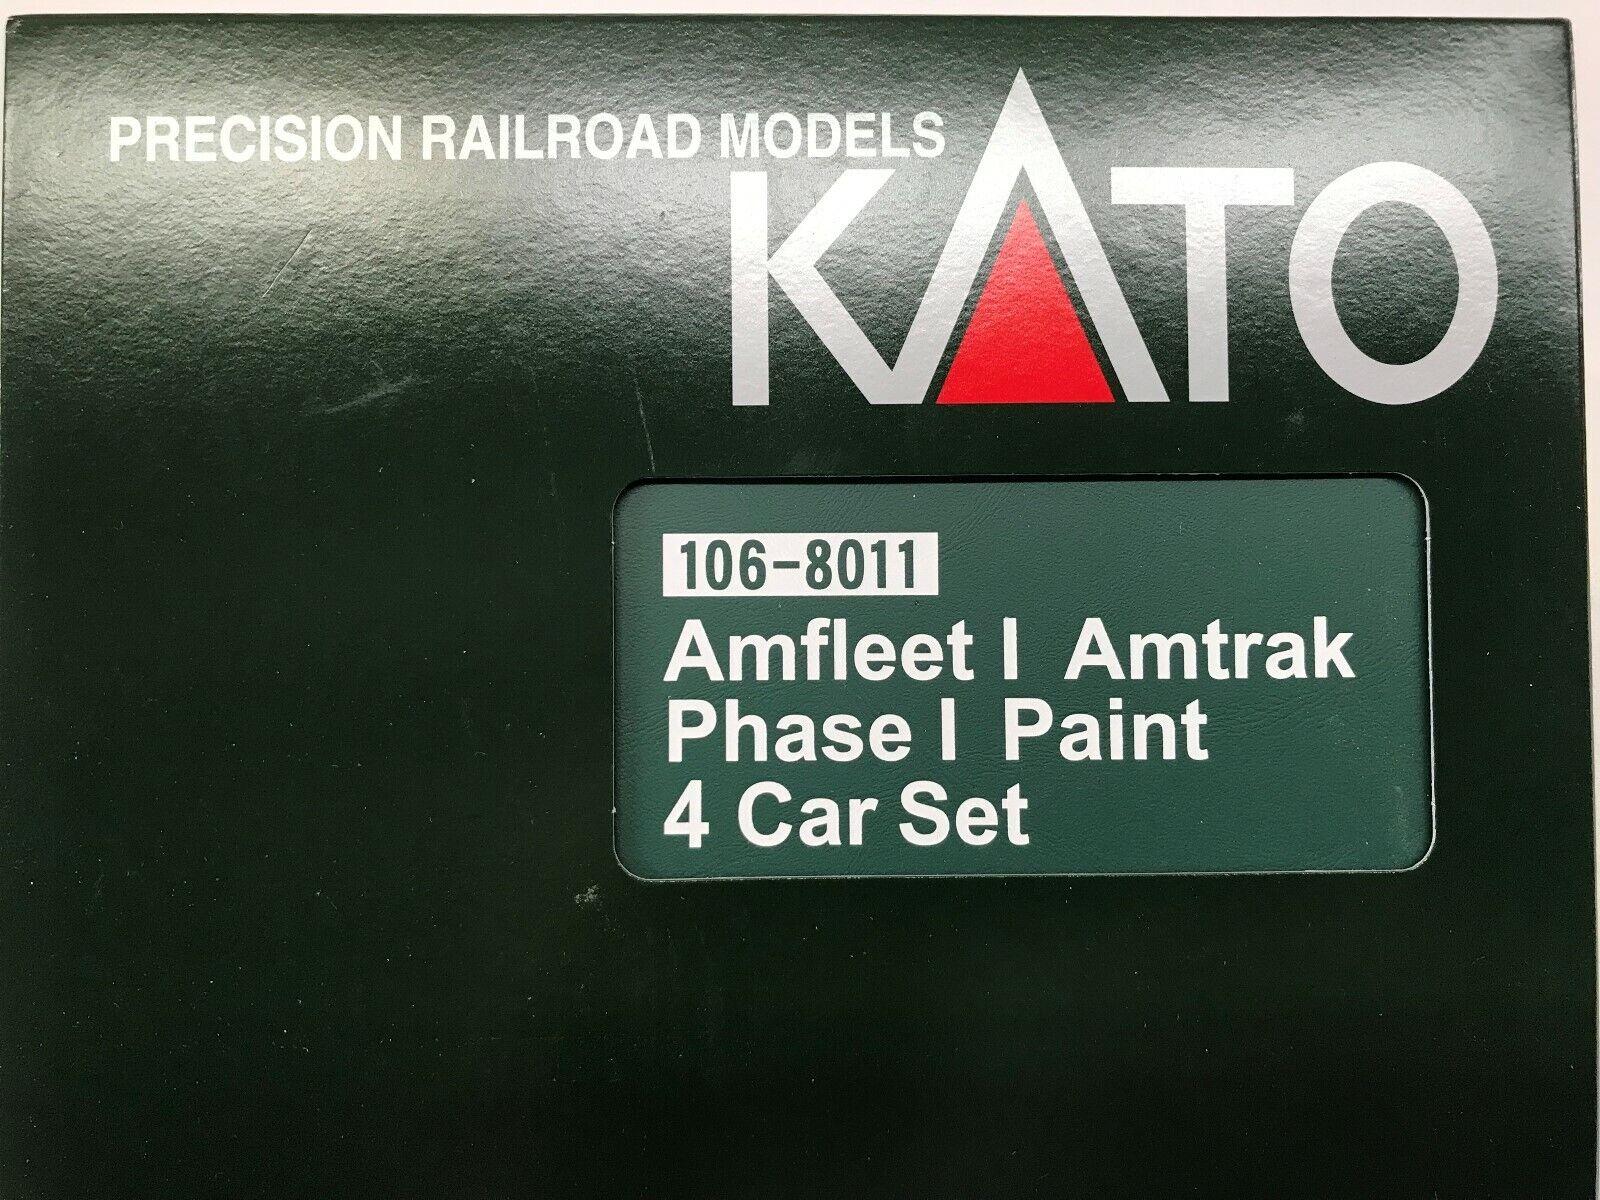 Kato AMTRAK autovetture 4 Set Per Auto Scala N fase i Amfleet Set di 4 1068011